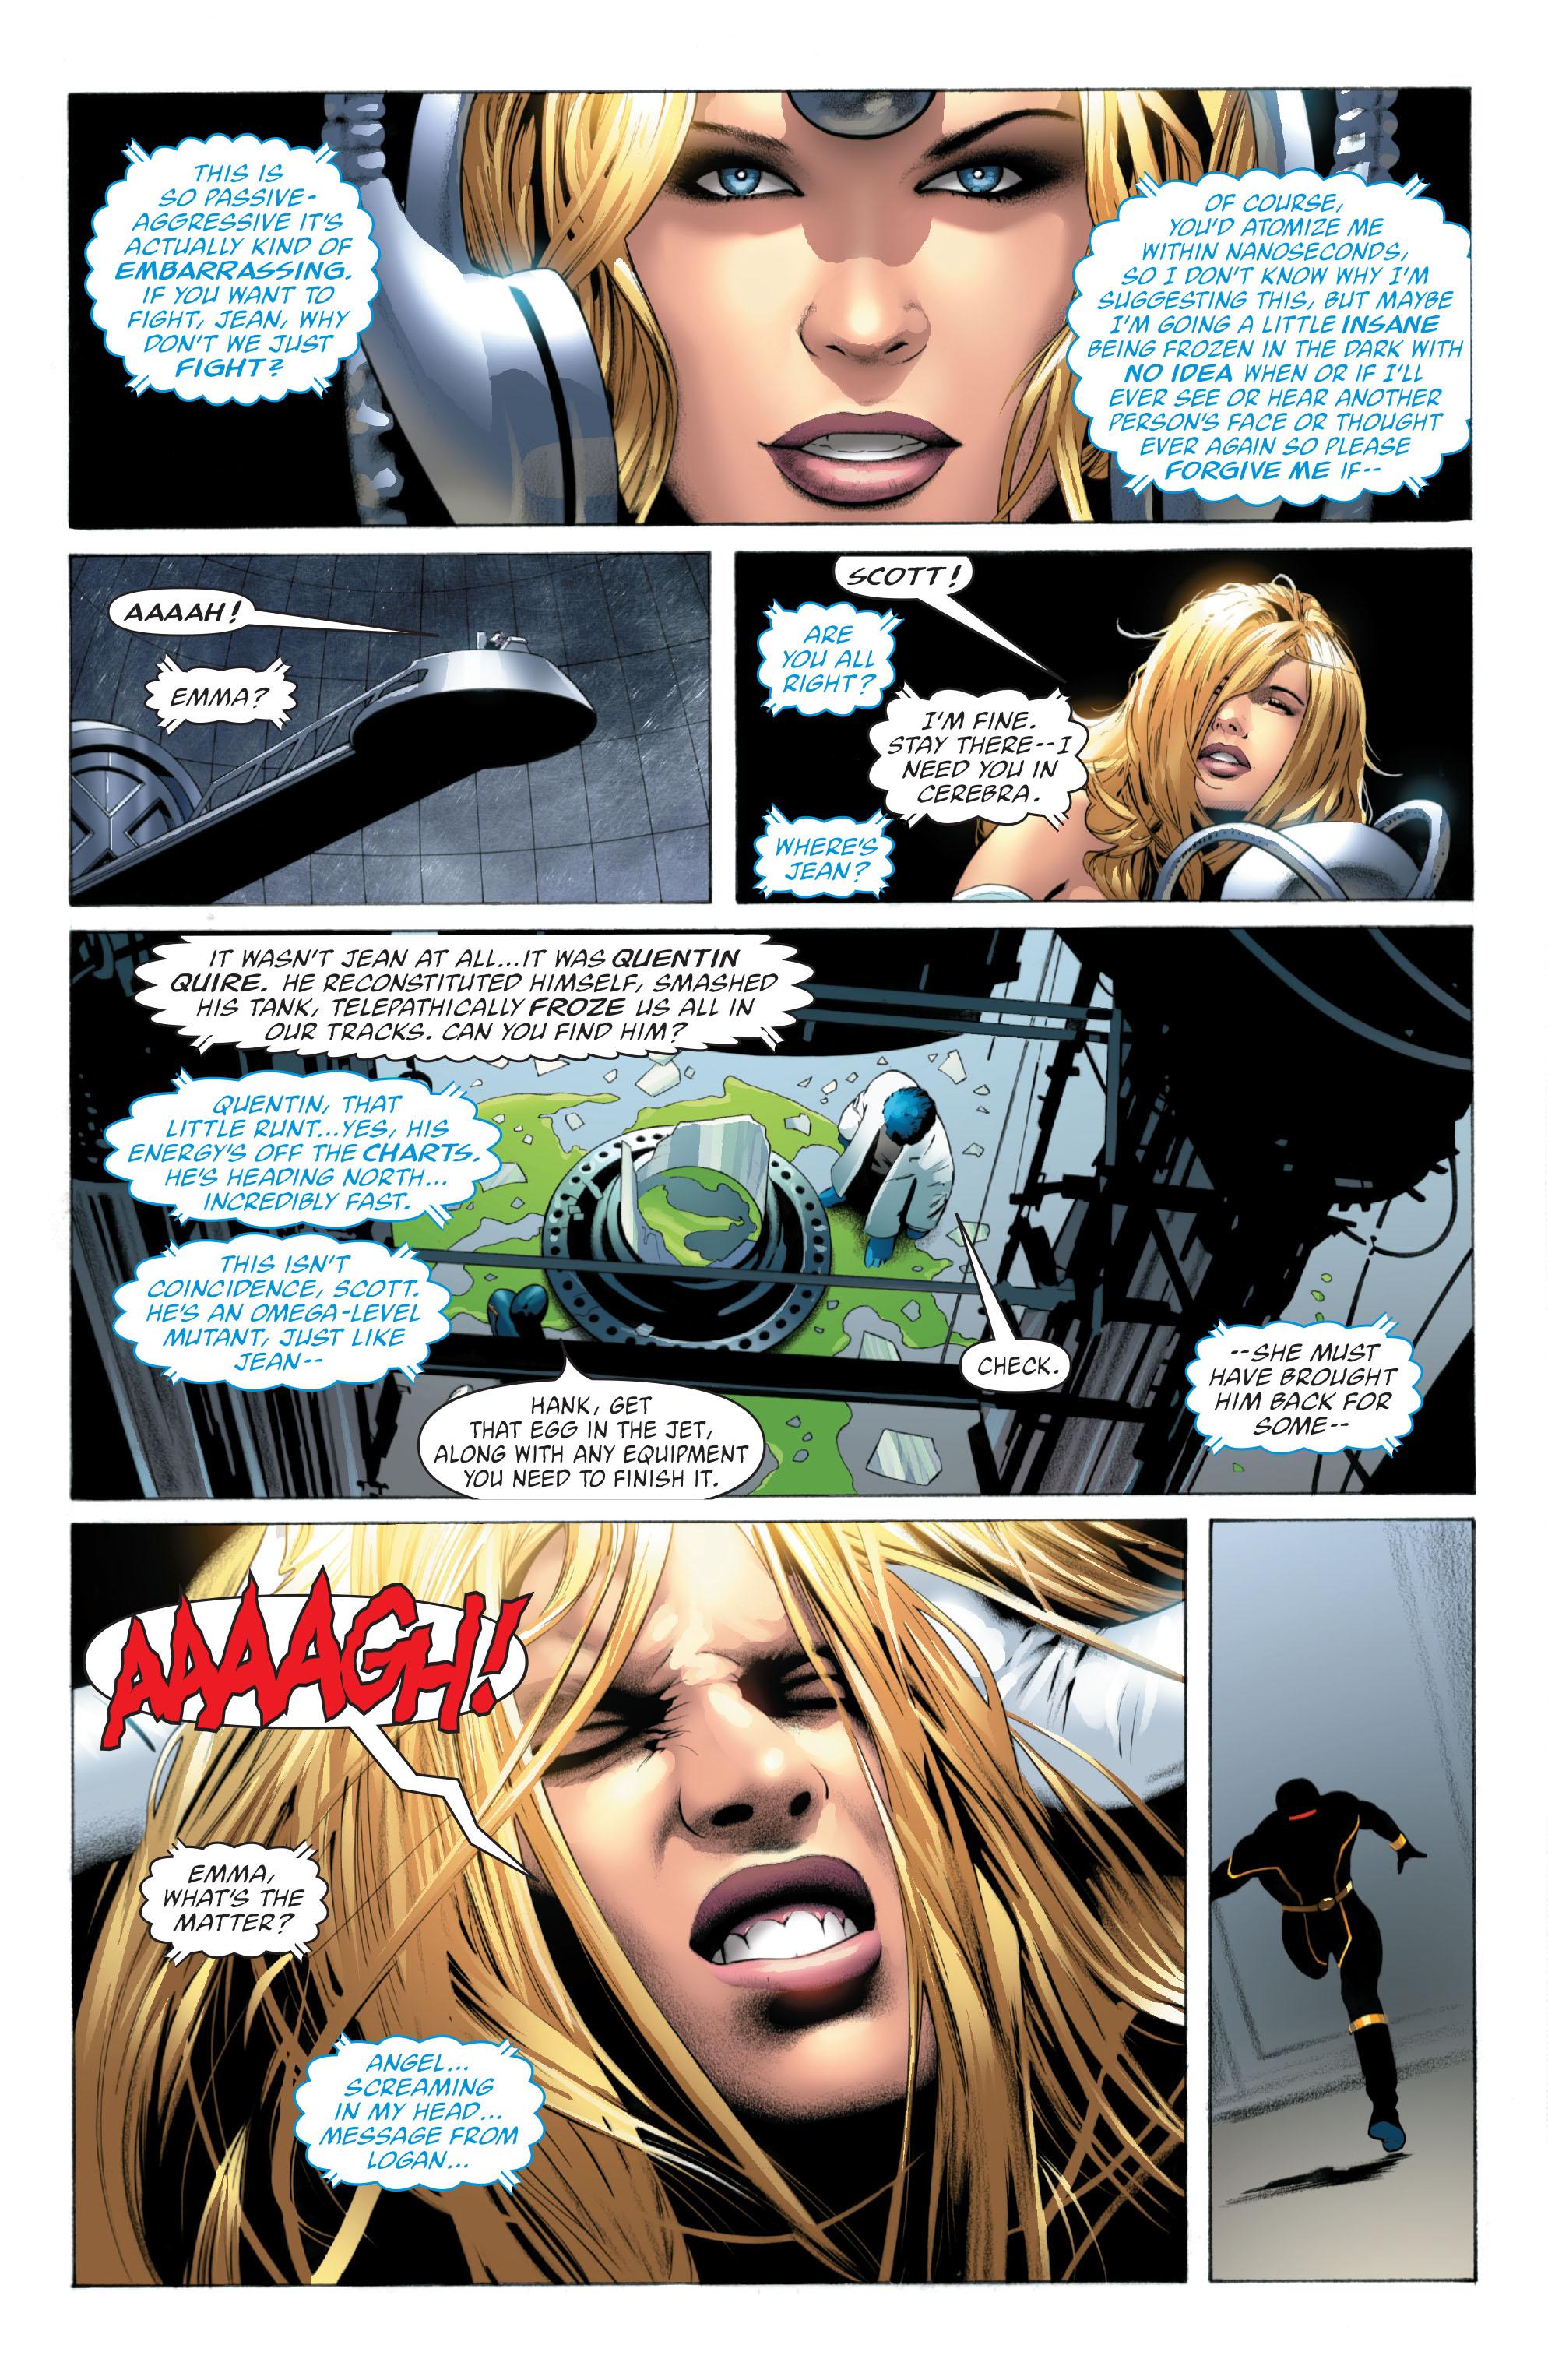 X-Men_ Phoenix Endsong (2005) #3 pg.06, lettered by Clem Robins.